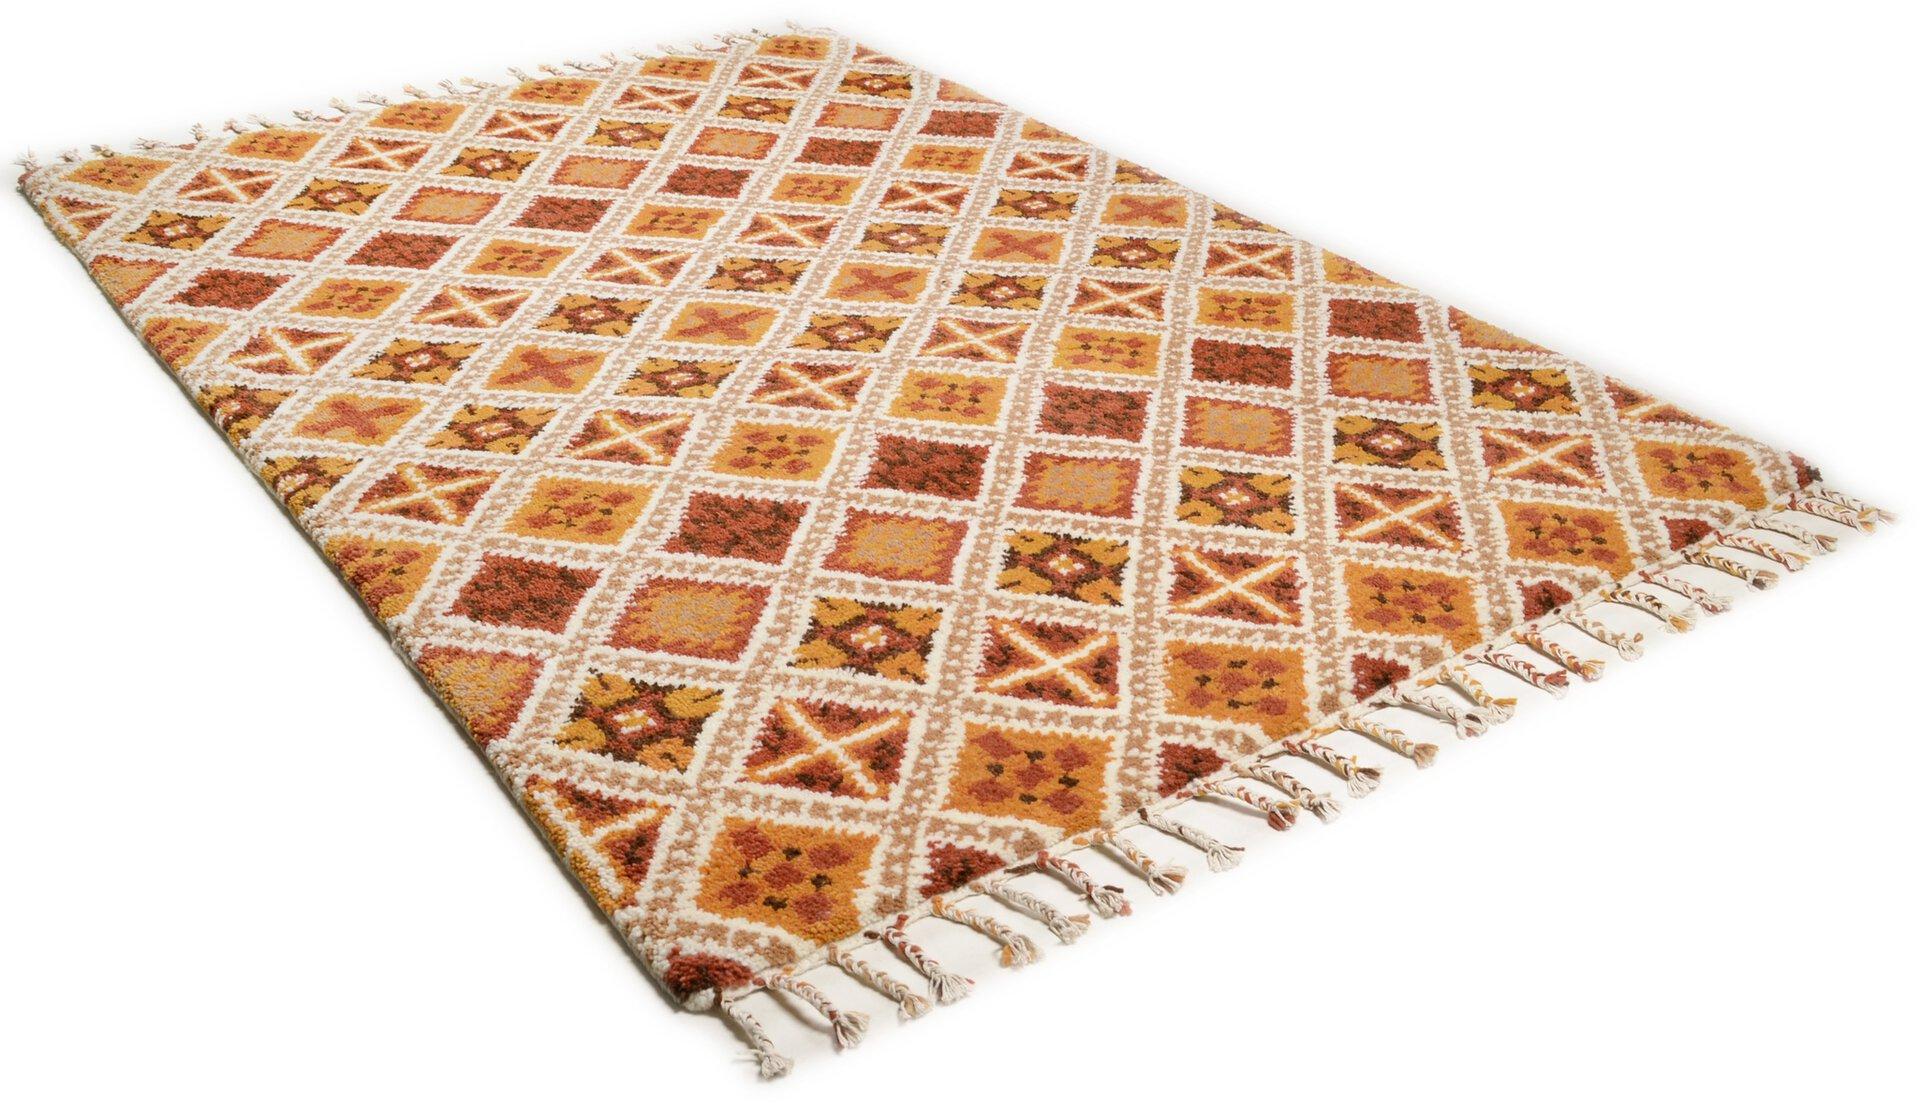 Handknüpfteppich Marmoucha Theko Textil orange 1 x 2 cm